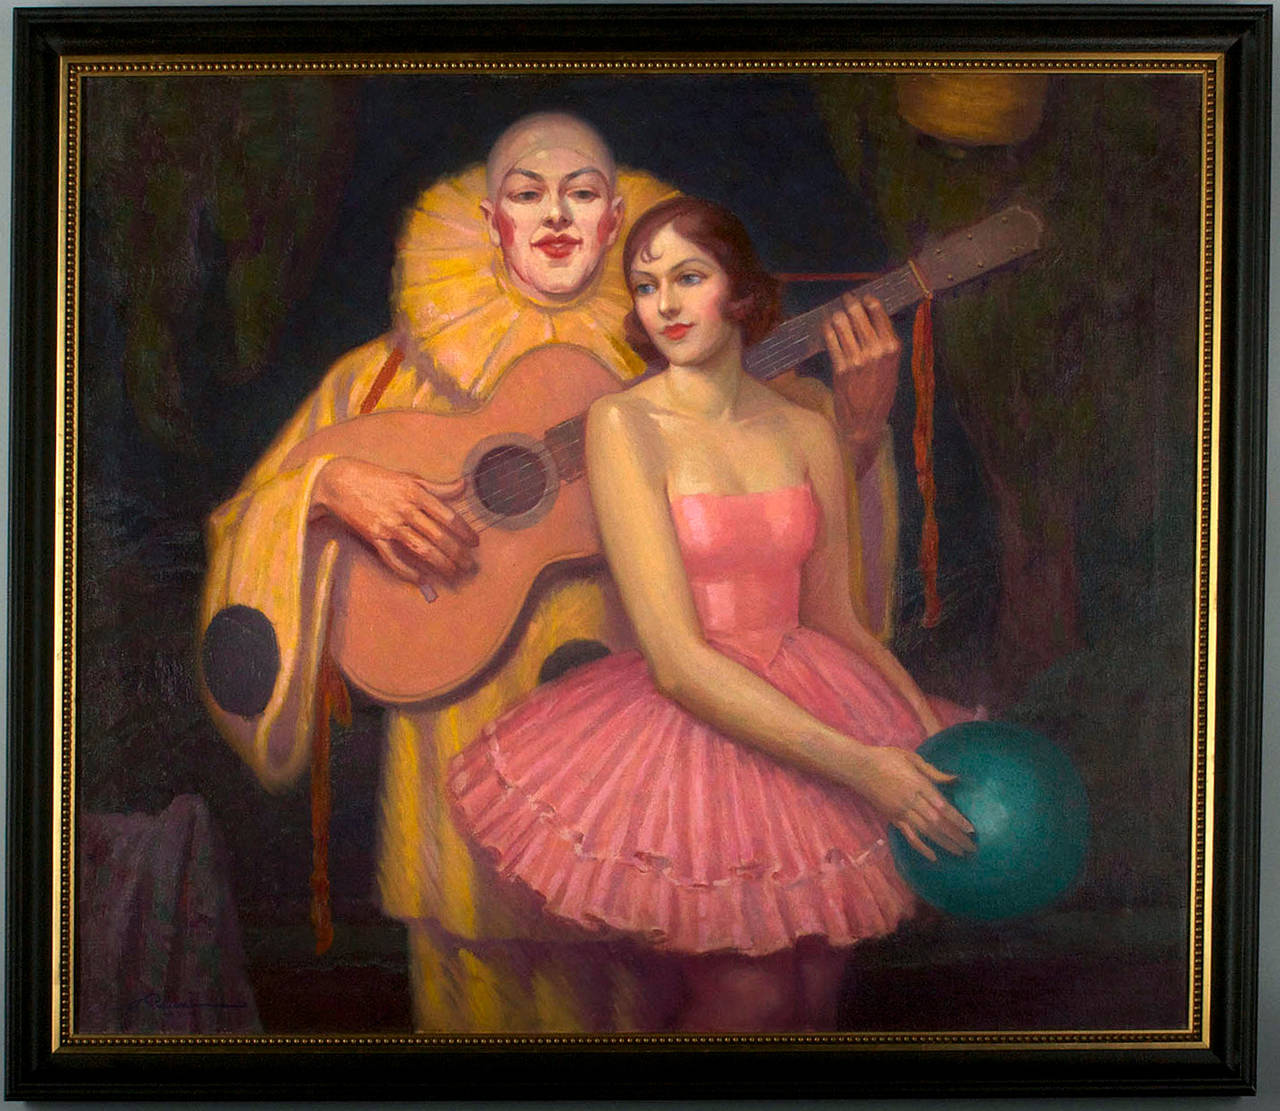 Pierrot and Ballerina Art Deco Interior Scene - Painting by Alphonse Palumbo